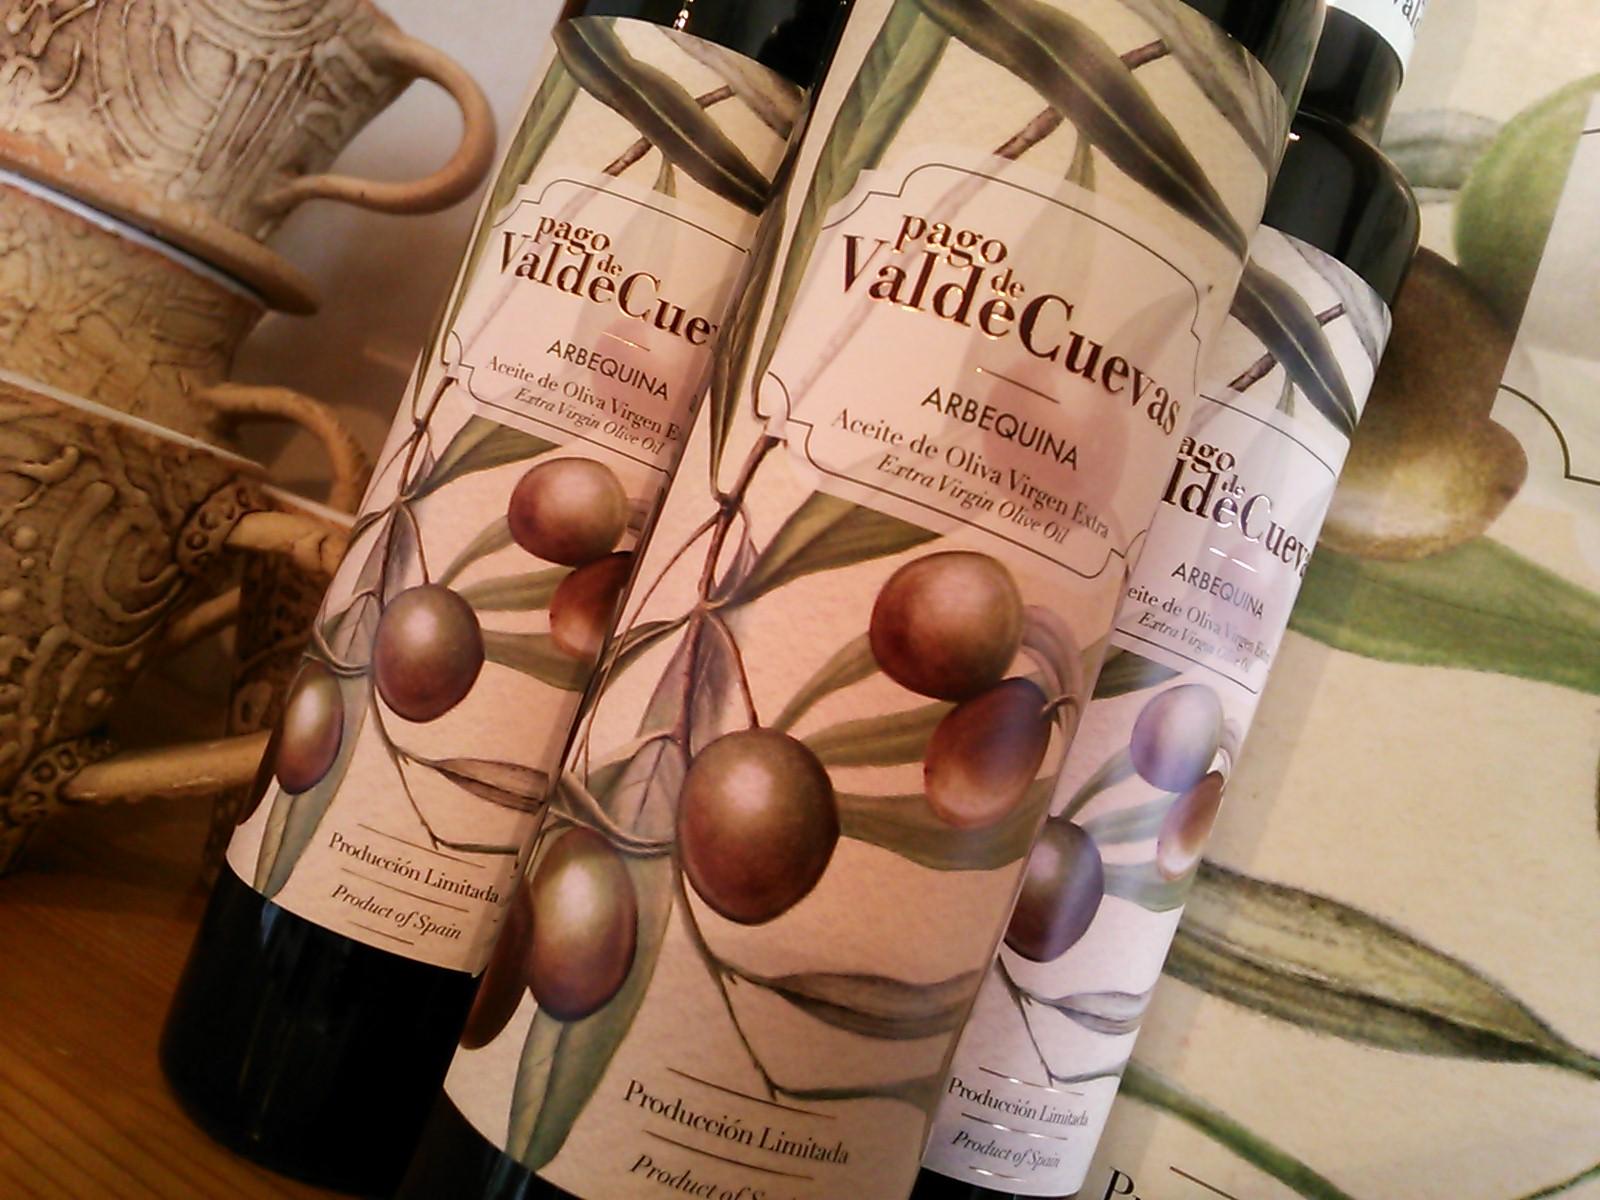 Pago de Valdecuevas Extra Virgin Olive Oil  (パゴ・デ・バルデクエバス エクストラヴァージンオリーブオイル)